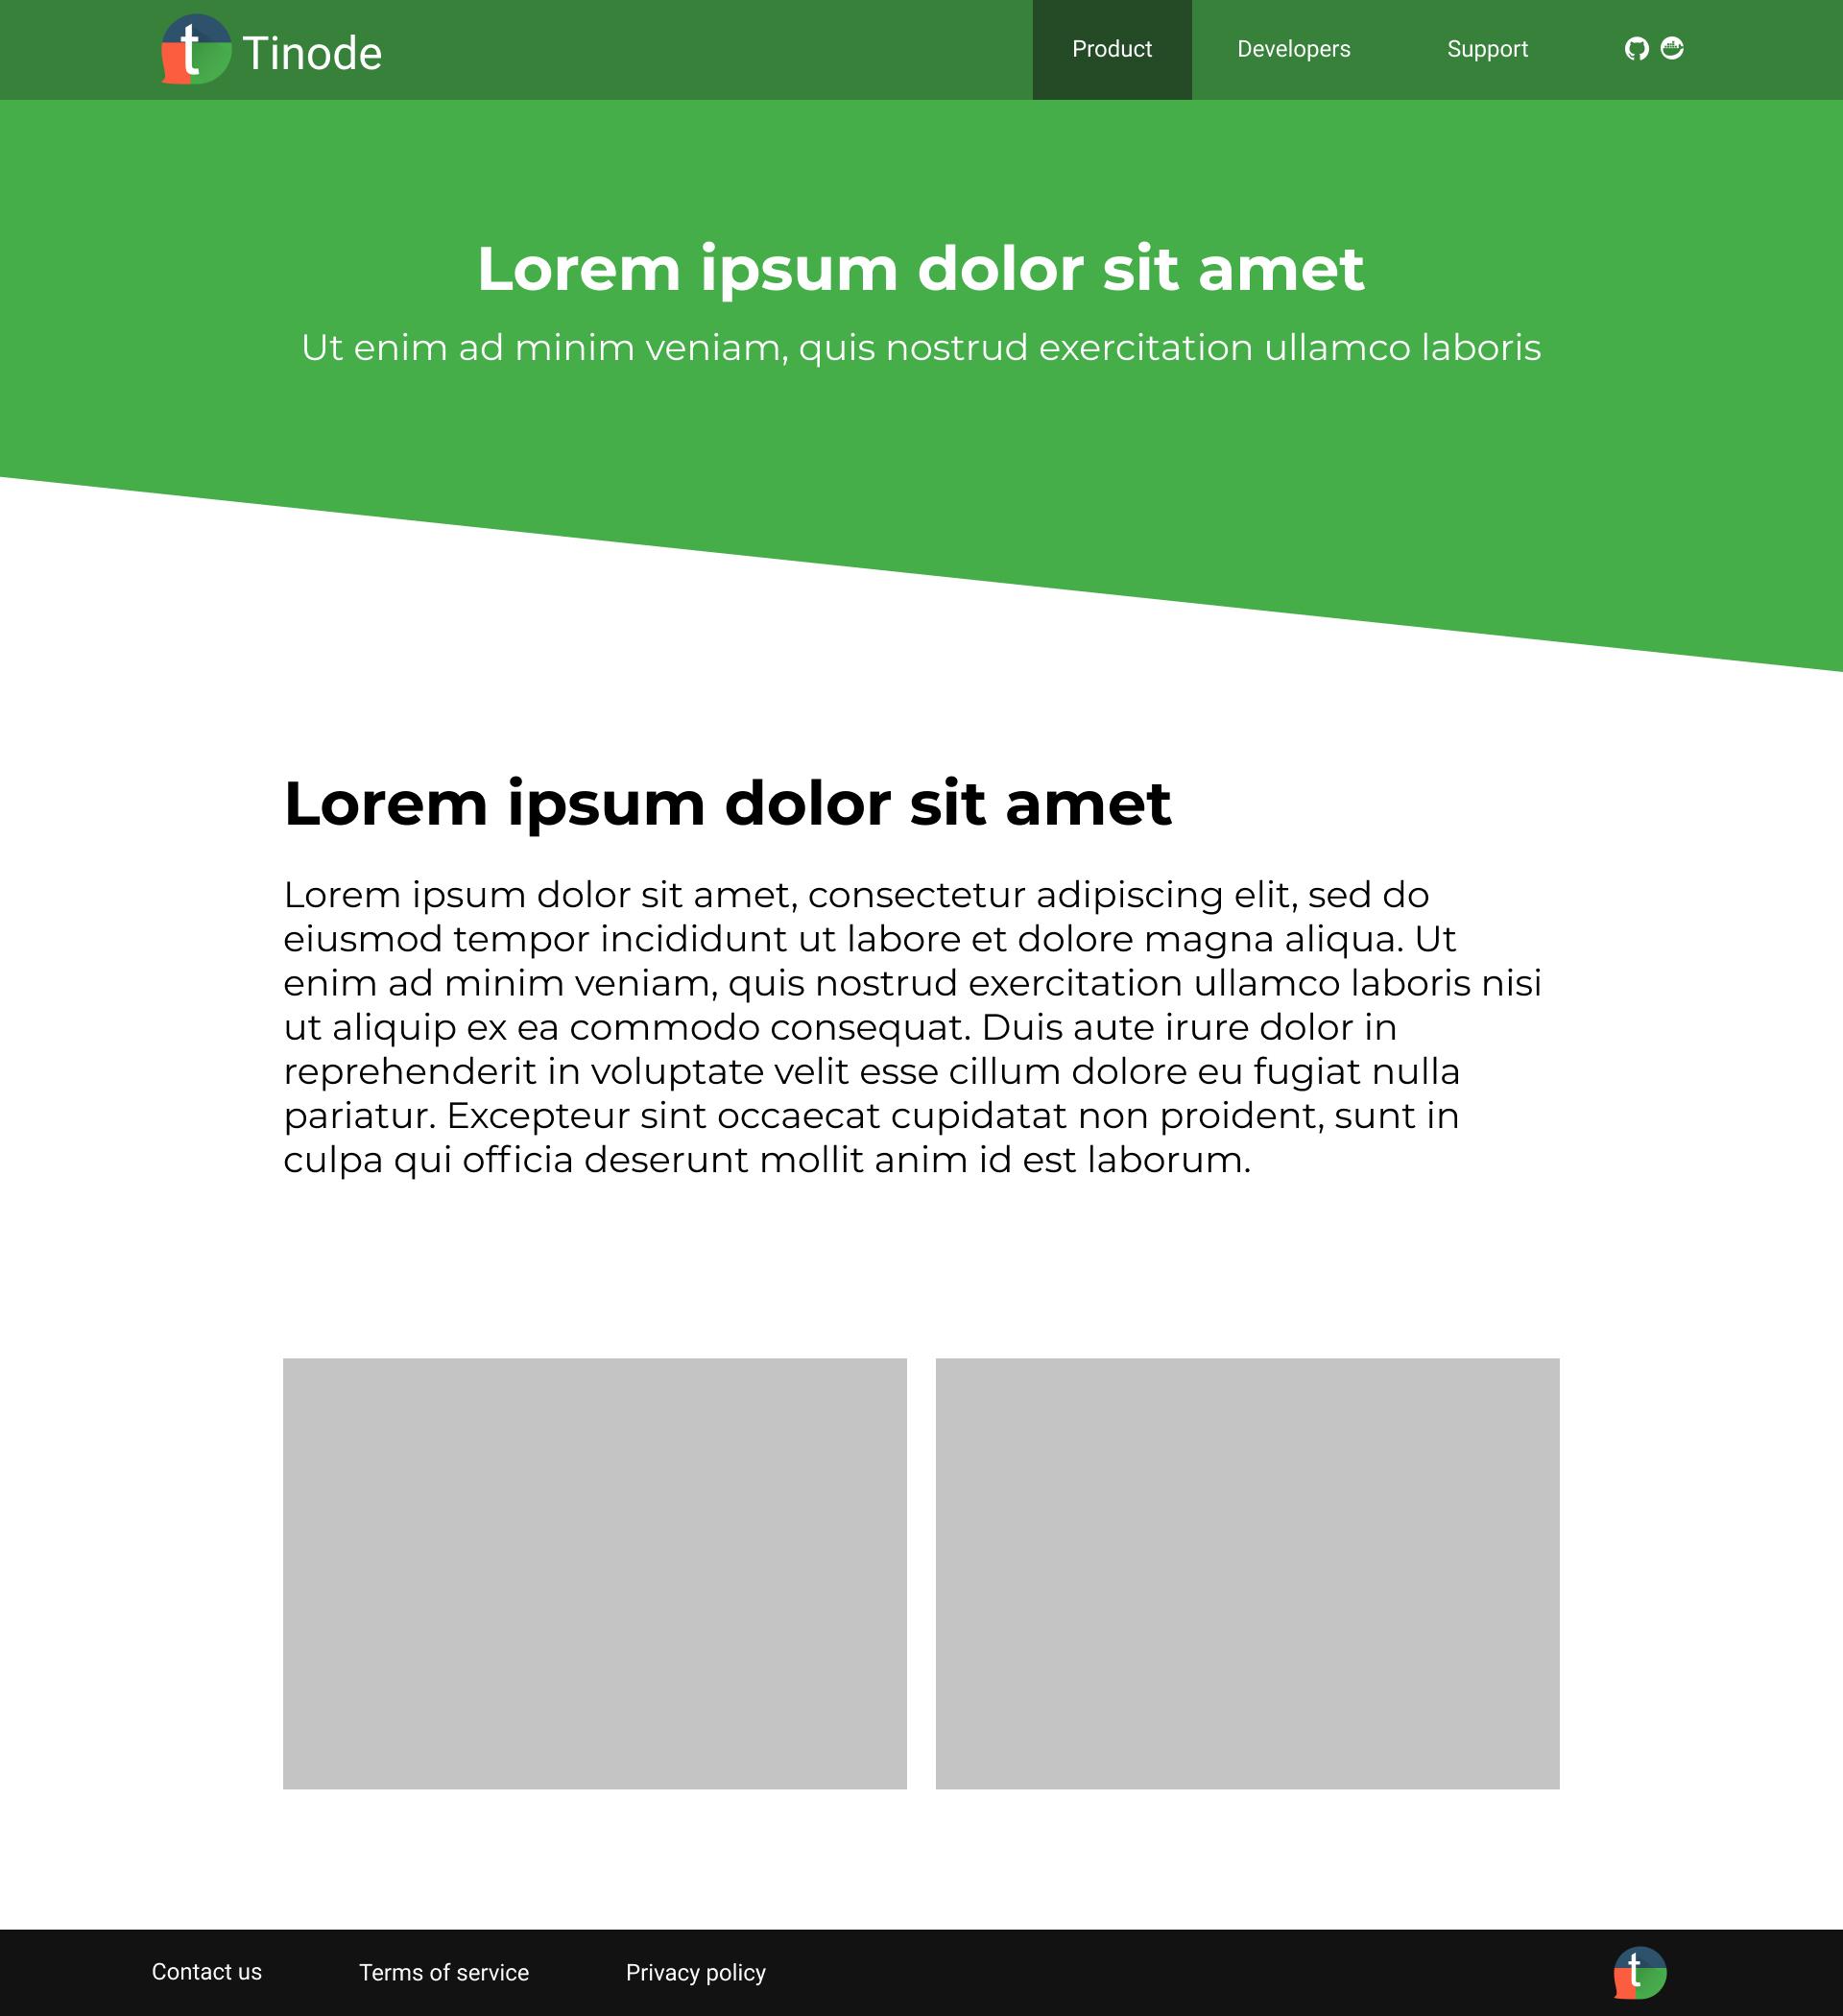 Дизайн сайта tinode.co фото f_8505d7238b6890b1.jpg